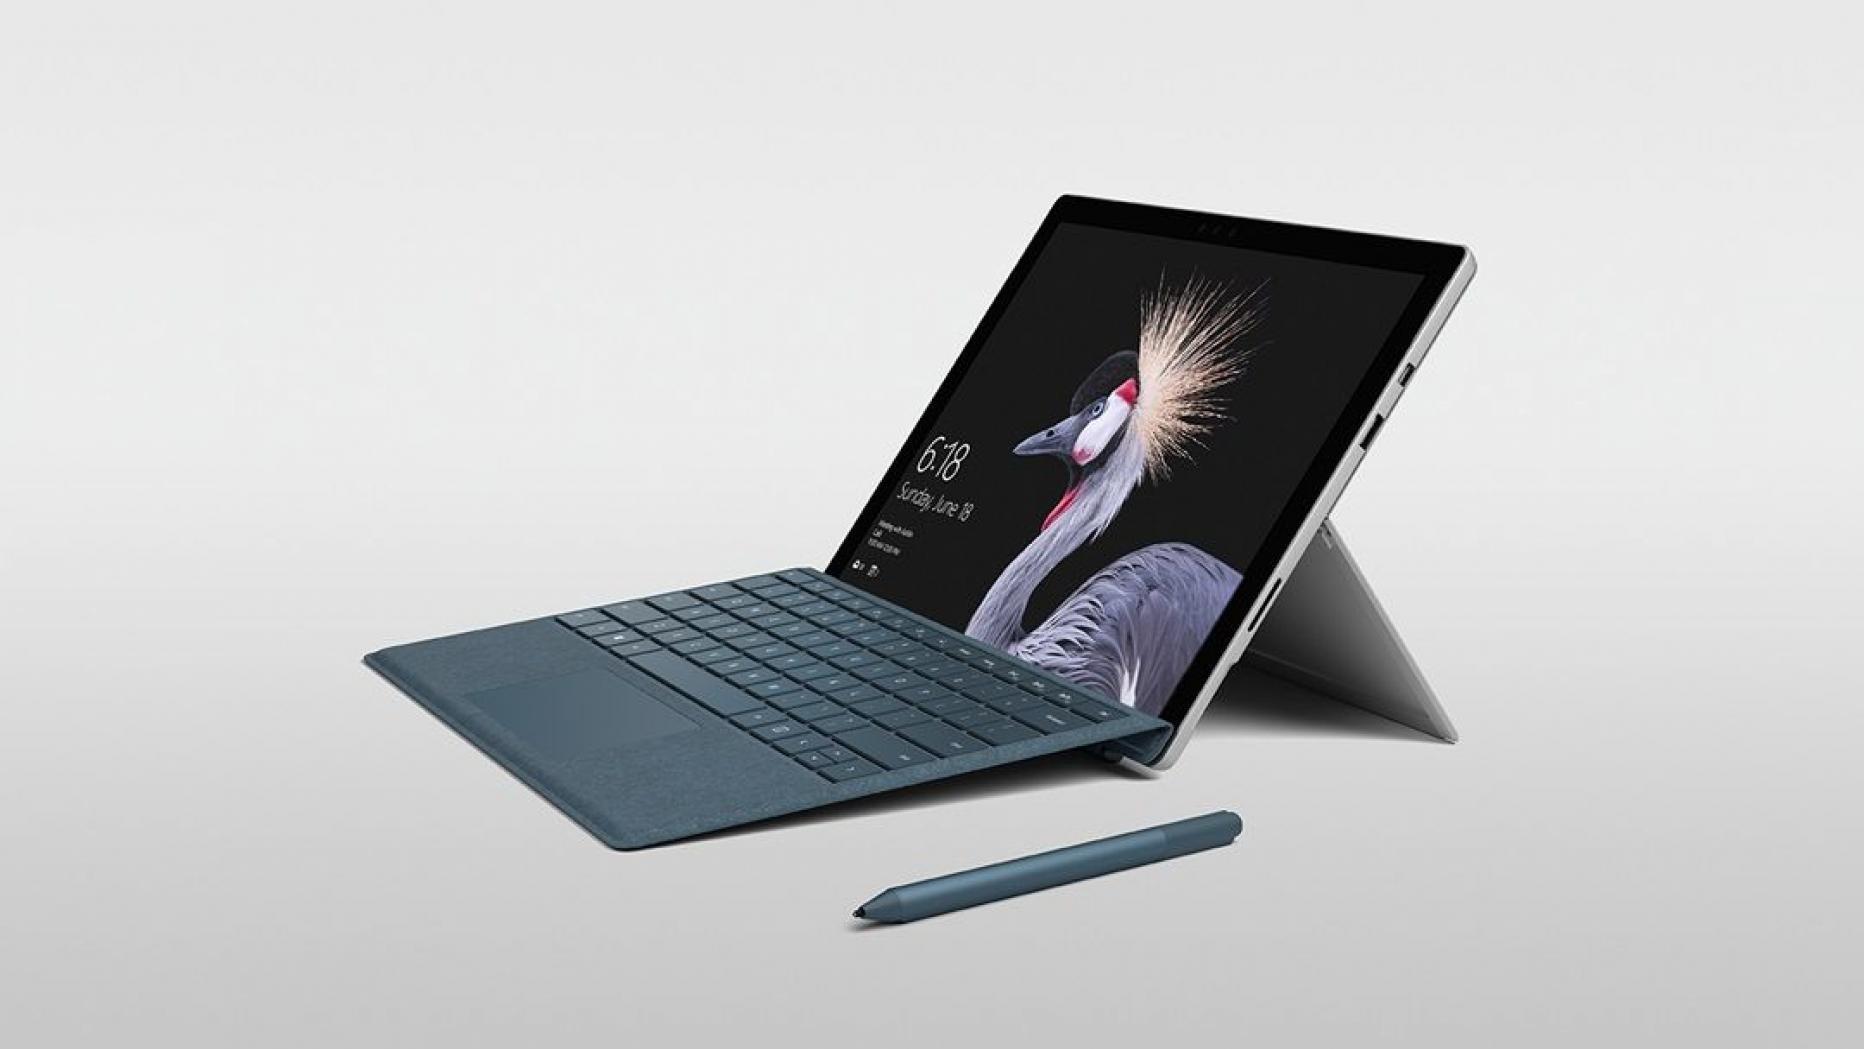 "Microsoft Surface Pro 7""width ="" 1864 ""height ="" 1049 ""srcset ="" https://www.maistecnologia.com/wp-content/uploads/2019/09/especificacoes-do-microsoft-surface-pro-7-ja-walk-through-ai-www.maistecnologia.com.jpg 1864w, https://www.maistecnologia.com/wp-content/uploads/2019/09/especificacoes-do-microsoft-surface-pro-7-ja-walk-by-ai-www.maistecnologia.com-300x169.jpg 300w, https://www.maistecnologia.com/wp-content/uploads/2019/09/especificacoes-do-microsoft-surface-pro-7-ja-walk-through-ai-www.maistecnologia.com-768x432.jpg 768w, https://www.maistecnologia.com/wp-content/uploads/2019/09/especificacoes-do-microsoft-surface-pro-7-ja-walk-by-ai-www.maistecnologia.com-1024x576.jpg 1024w, https://www.maistecnologia.com/wp-content/uploads/2019/09/especificacoes-do-microsoft-surface-pro-7-ja-walk-by-ai-www.maistecnologia.com-696x392.jpg 696w, https://www.maistecnologia.com/wp-content/uploads/2019/09/especificacoes-do-microsoft-surface-pro-7-ja-walk-through-ai-www.maistecnologia.com-1068x601.jpg 1068w, https://www.maistecnologia.com/wp-content/uploads/2019/09/especificacoes-do-microsoft-surface-pro-7-ja-walk-by-ai-www.maistecnologia.com-746x420.jpg 746w ""size ="" (max-width: 1864px) 100vw, 1864px"